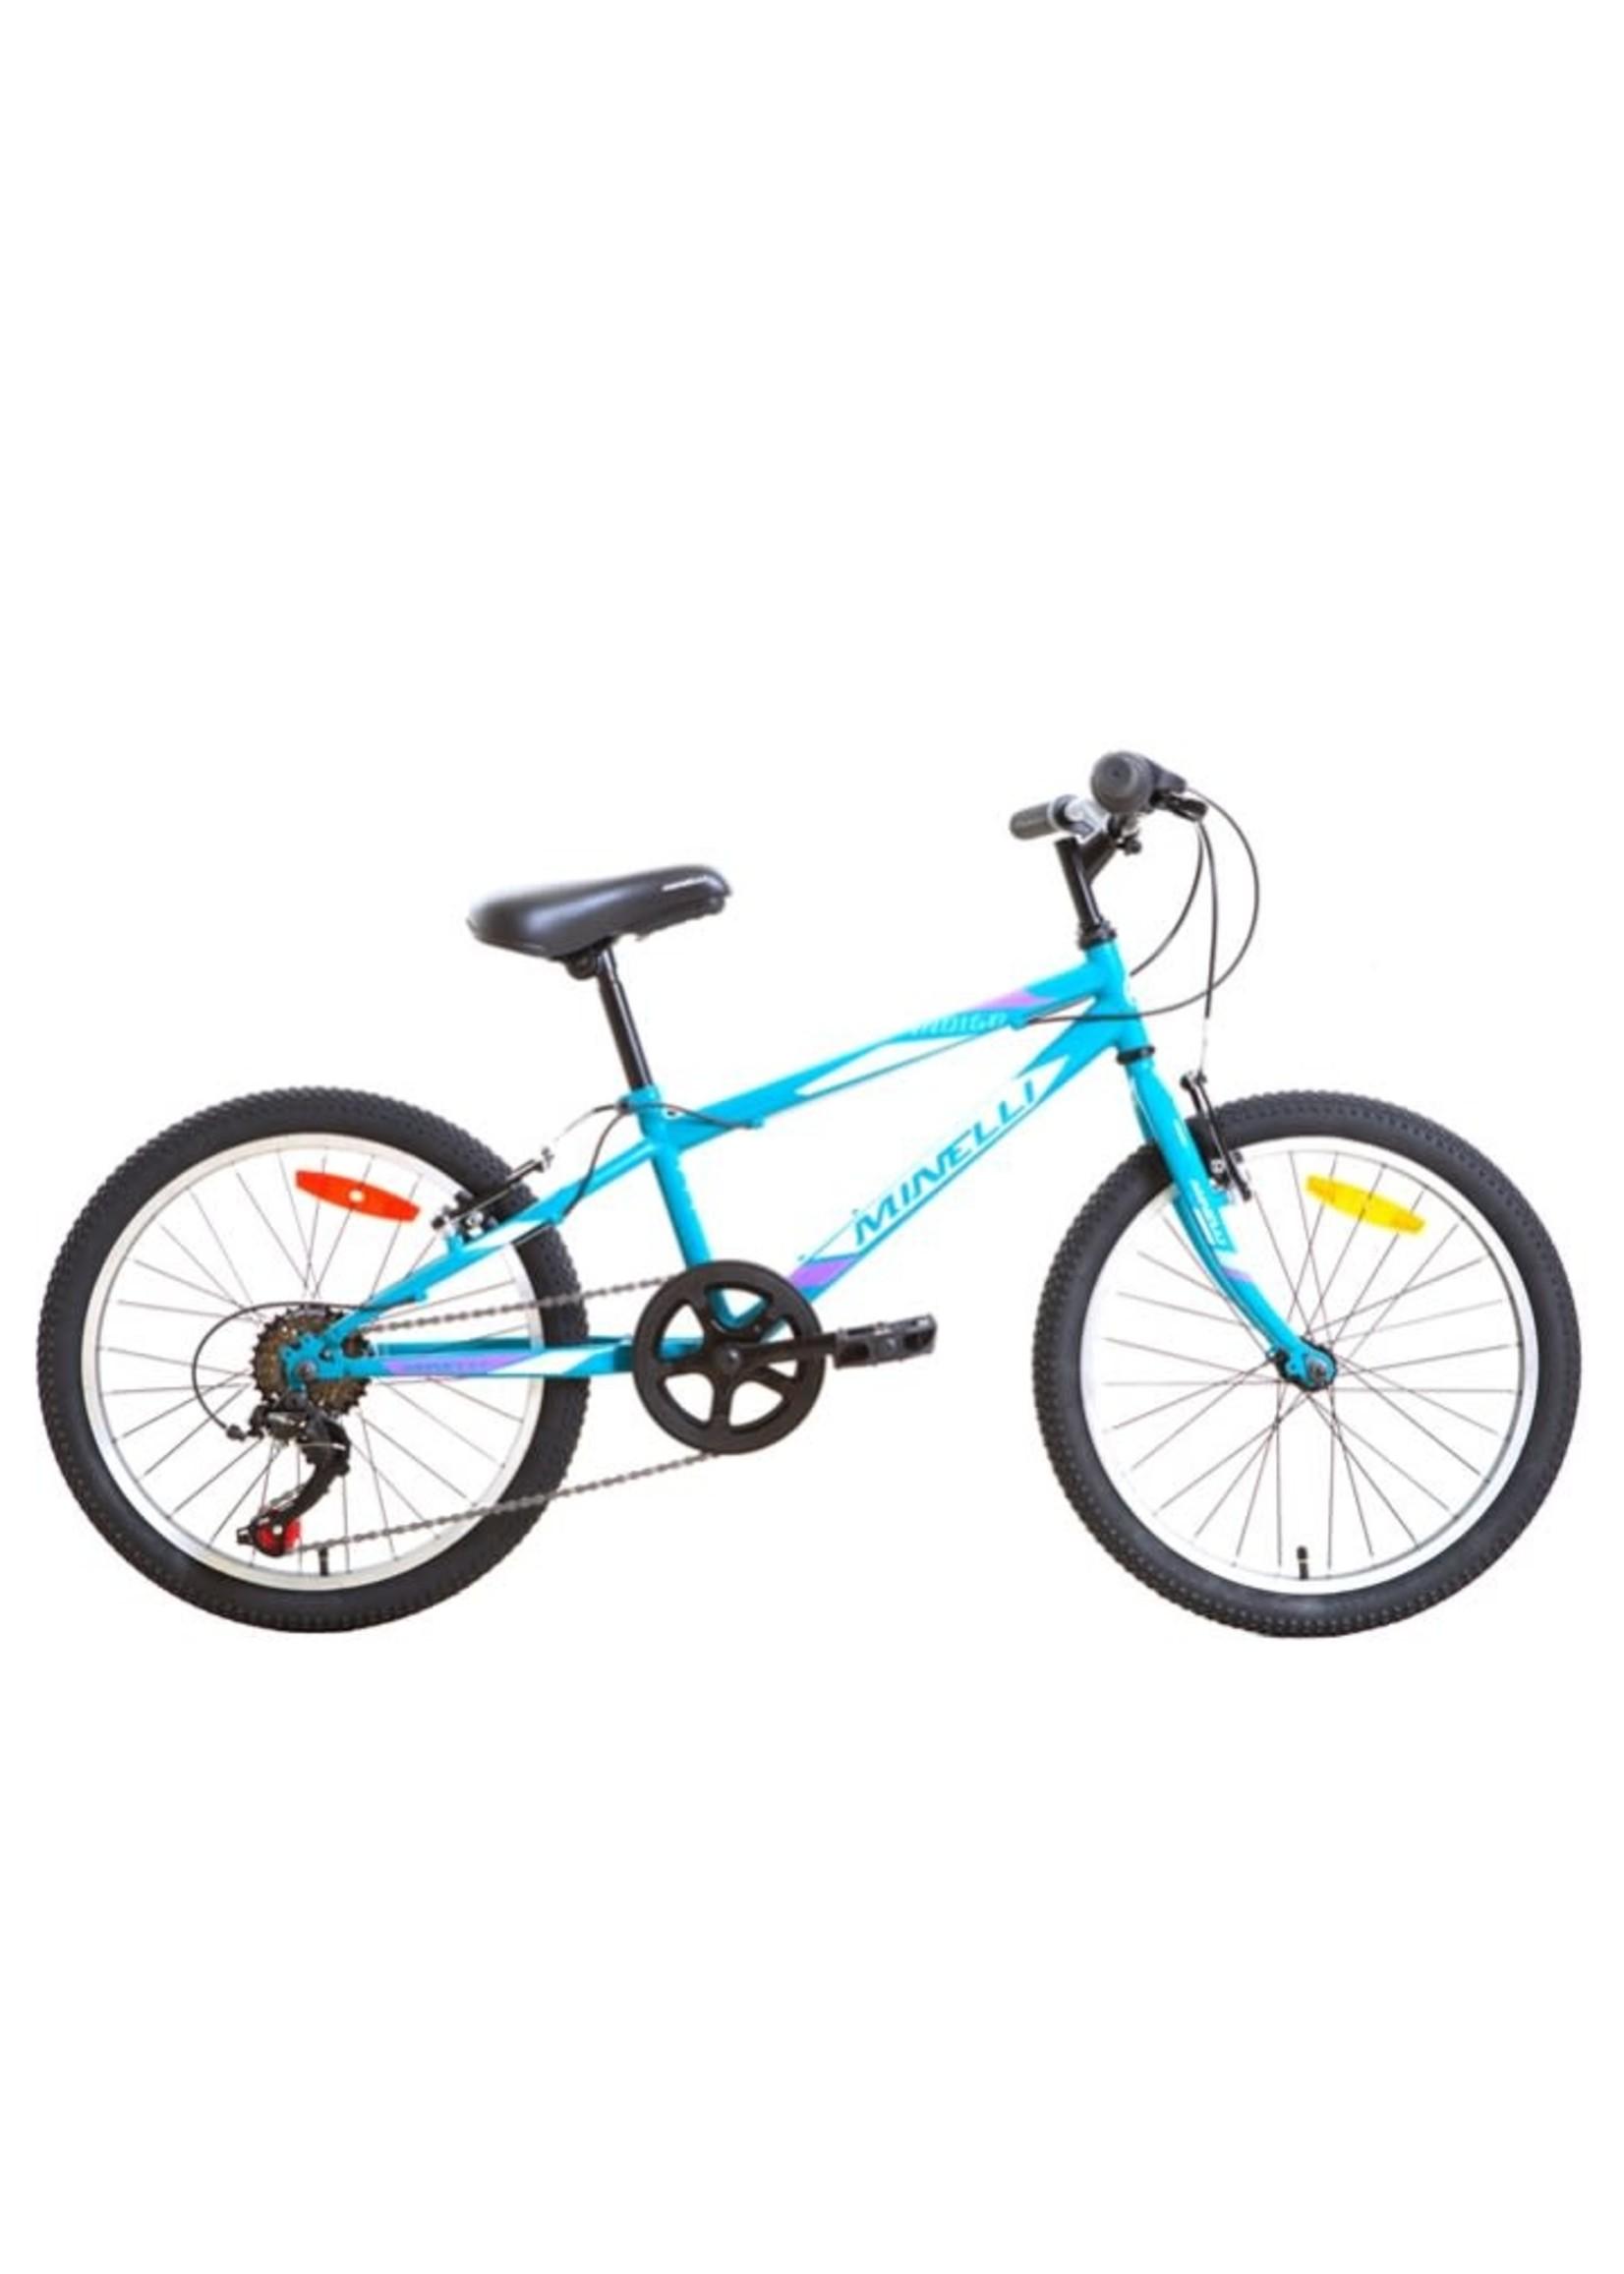 "MINELLI Vélo Indigo 20"" - Aqua/Noir"